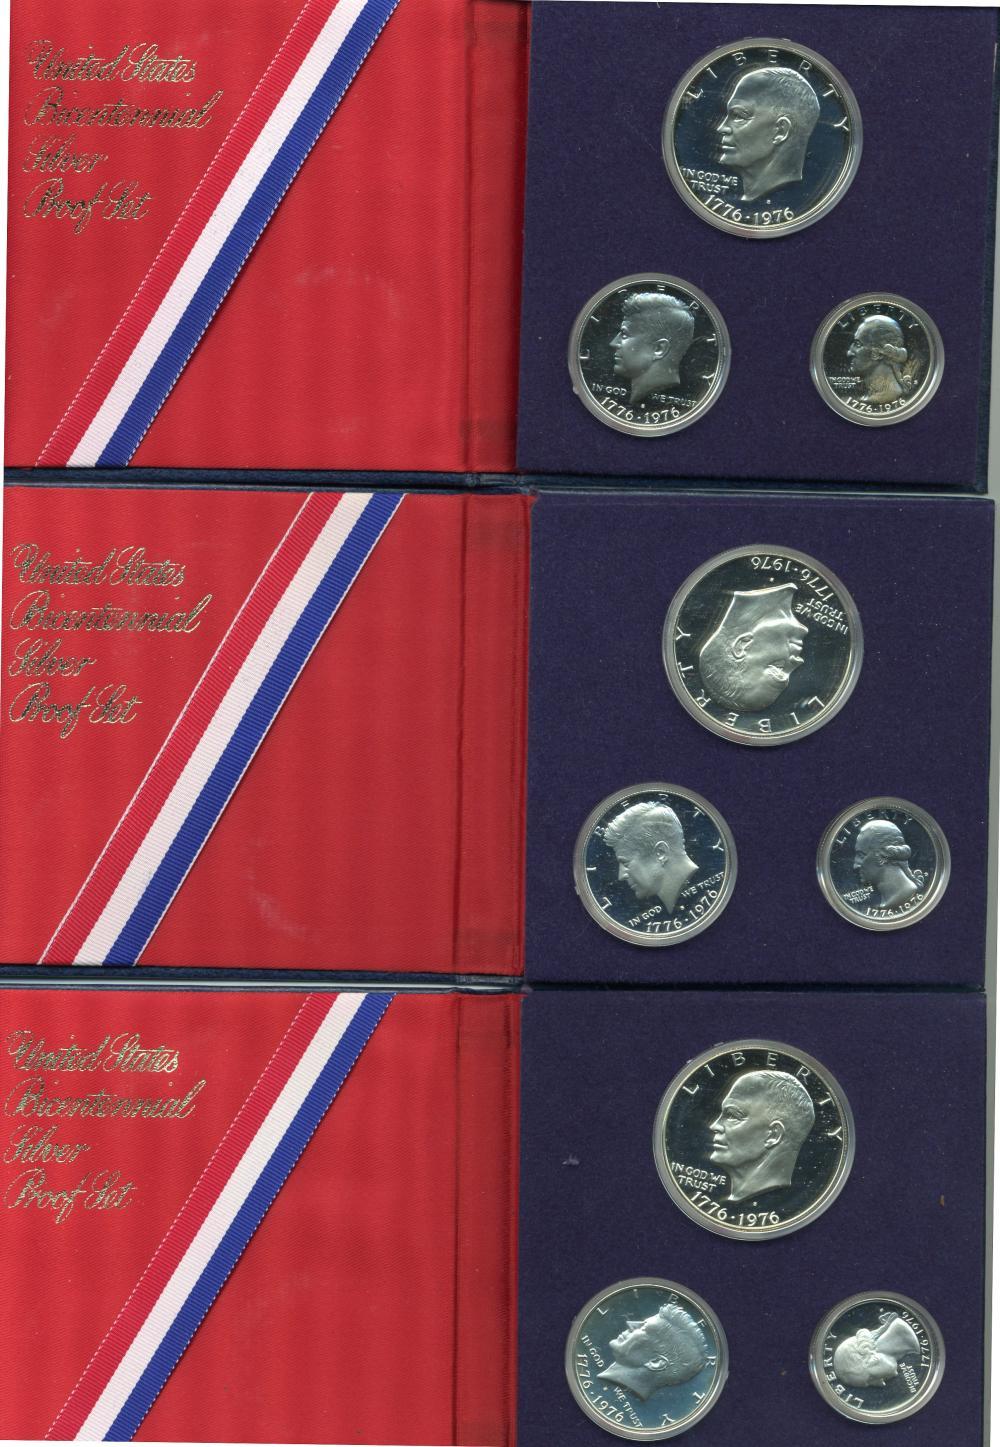 (3) Original 1976 U.S. Bicentennial Silver Proof Sets